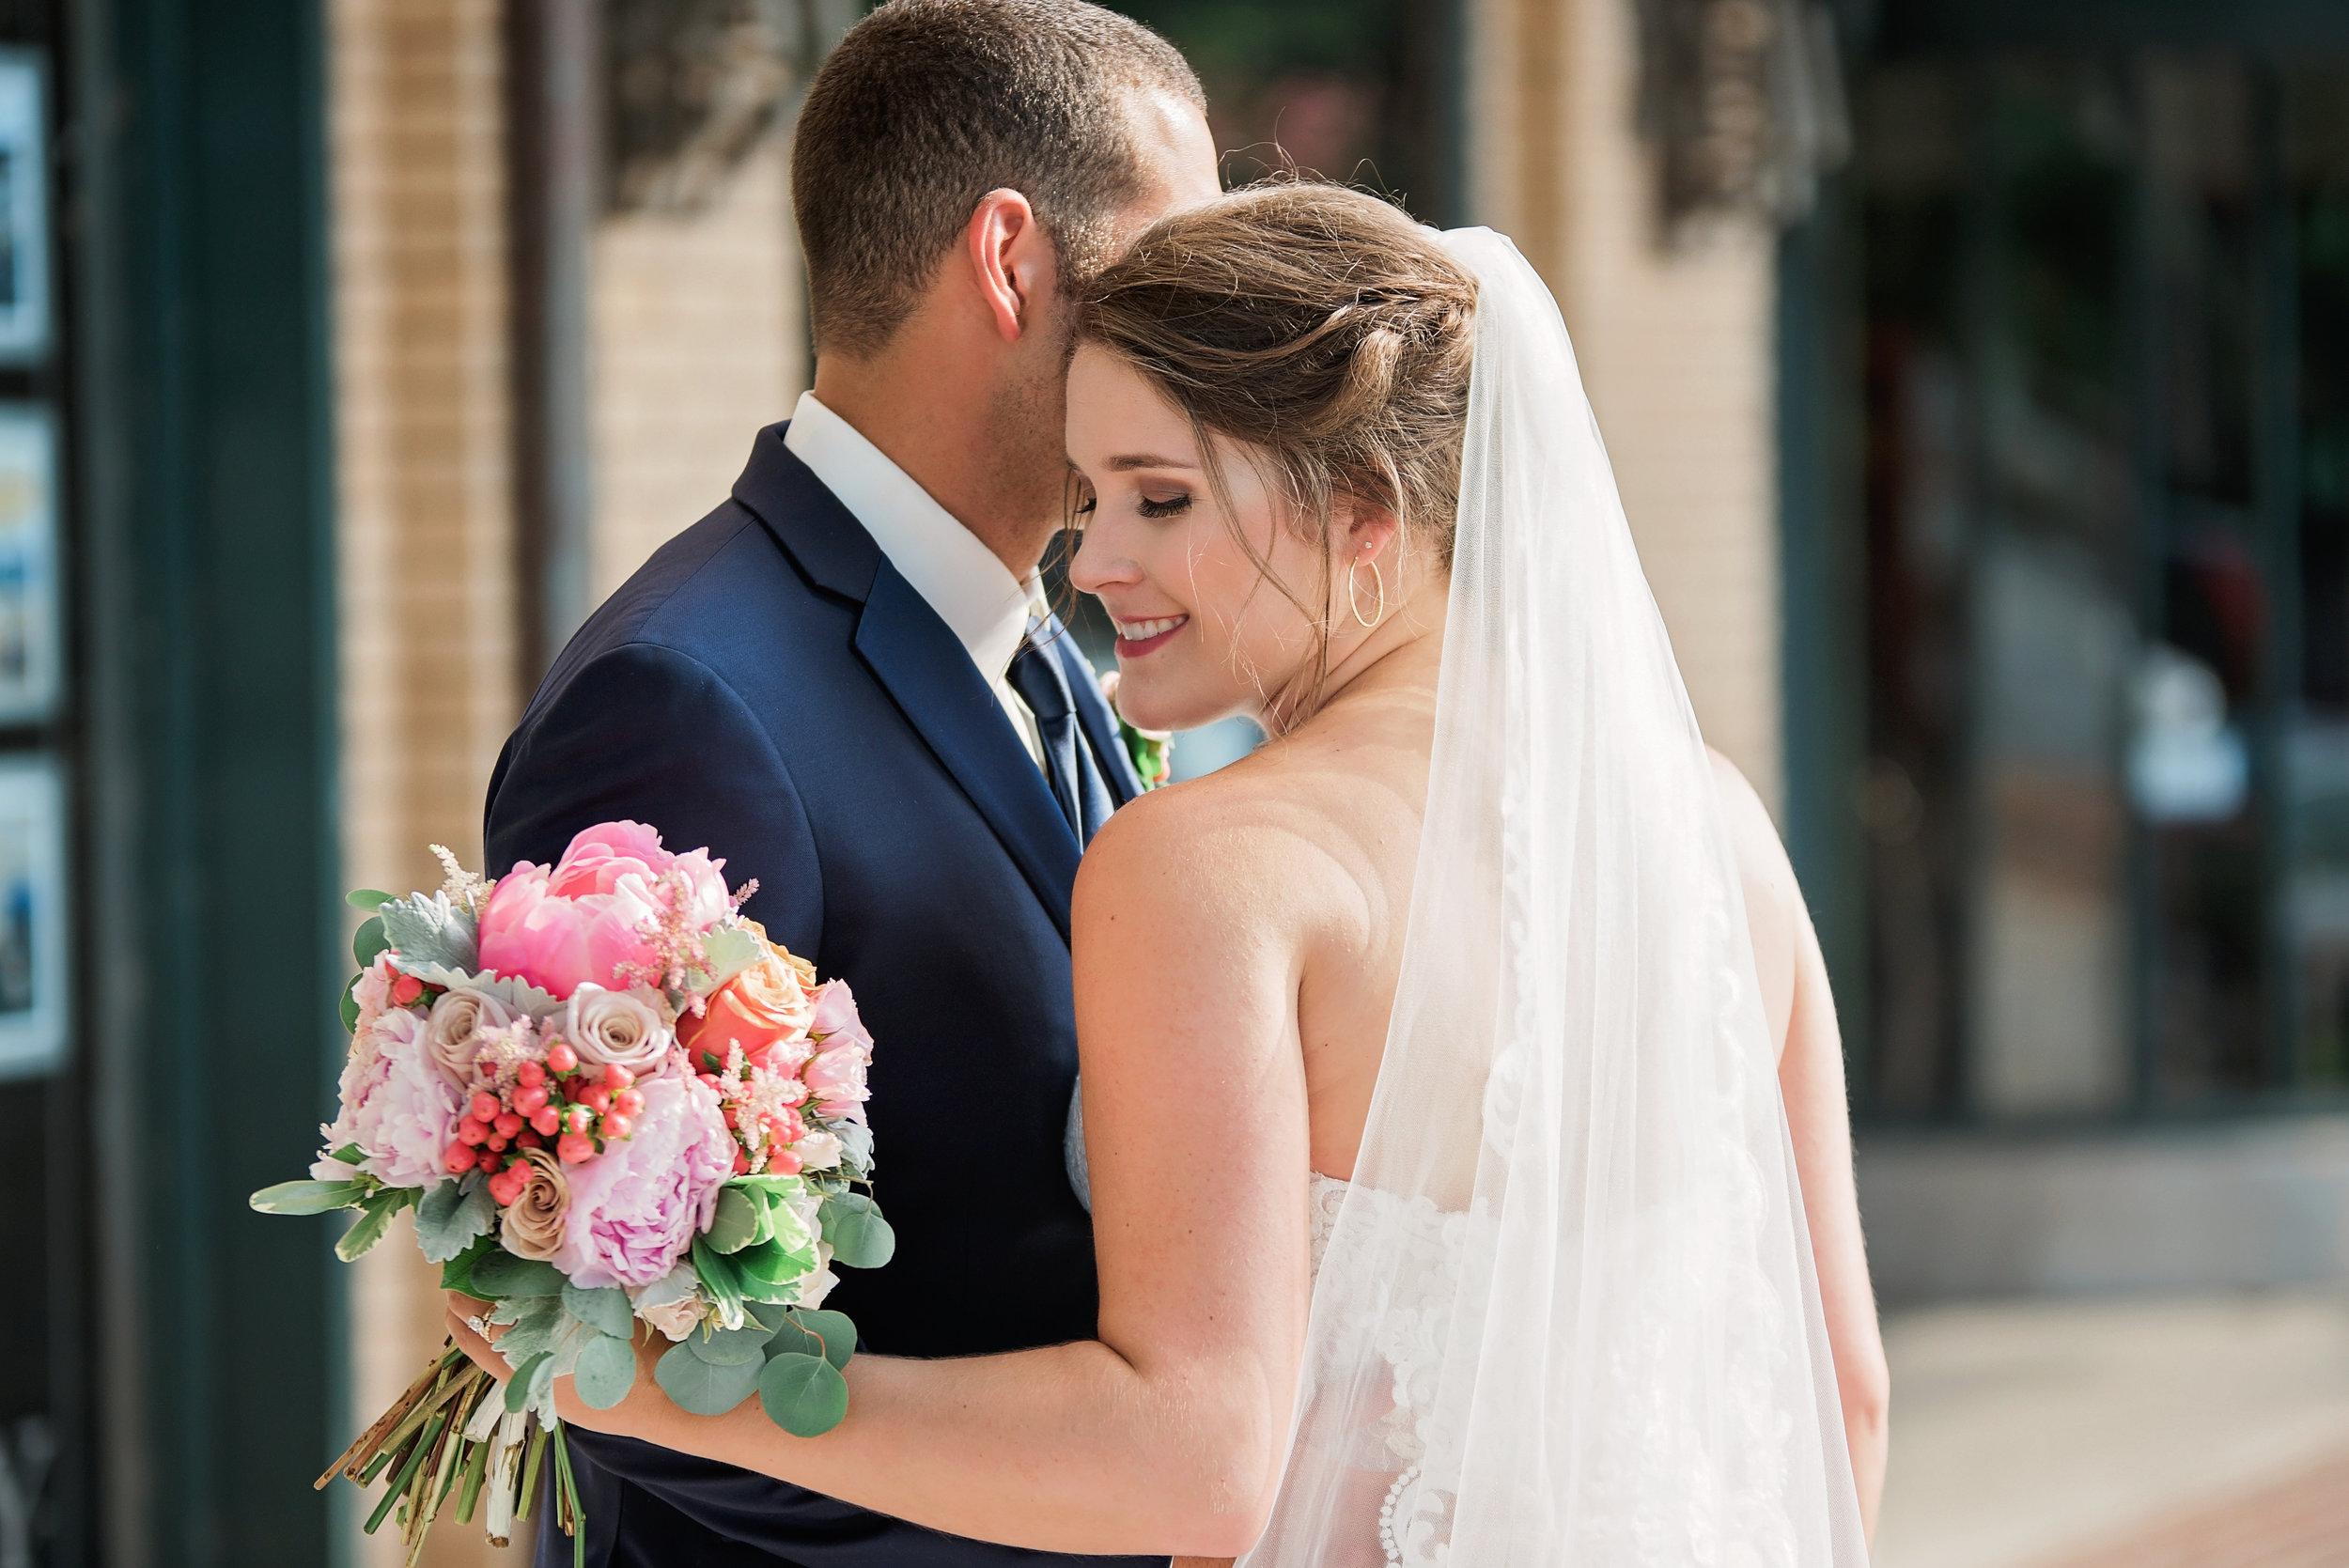 Rome Wedding 1st edits (19 of 36).jpg